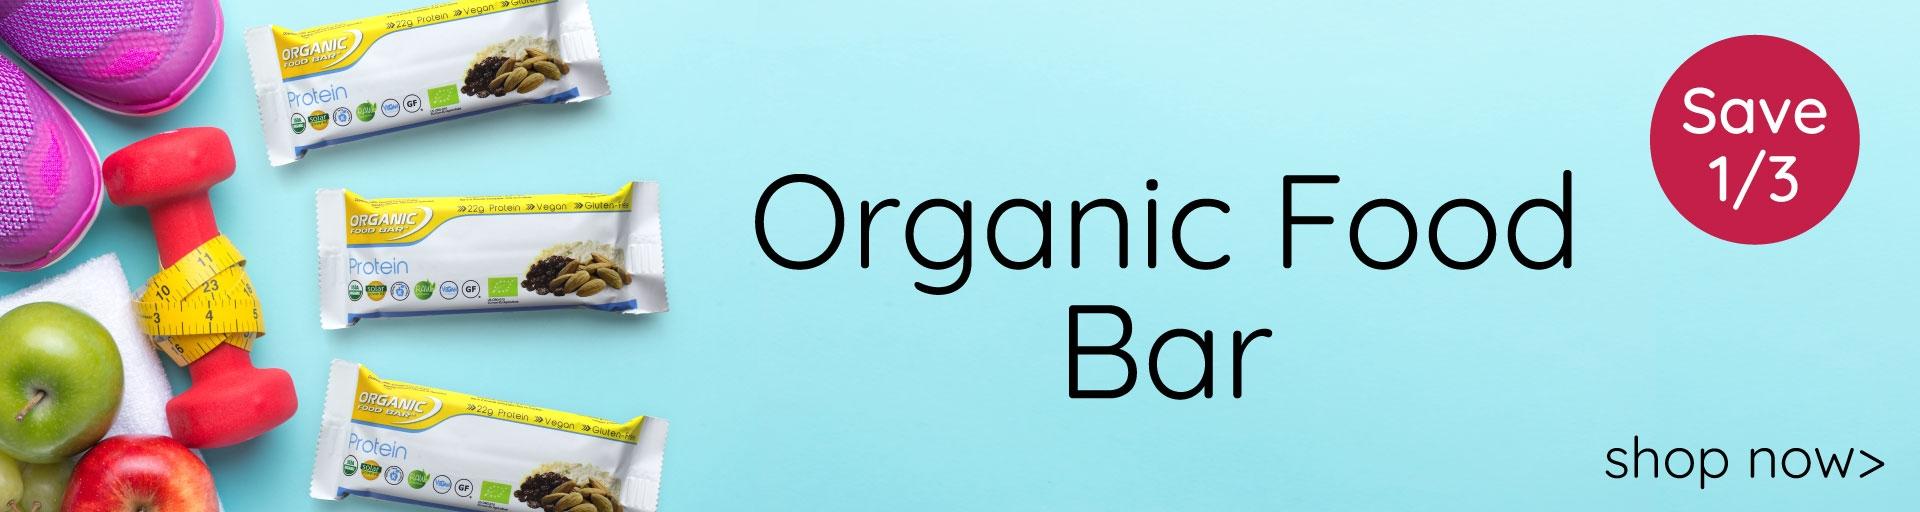 Organic Food Bars - 33% OFF